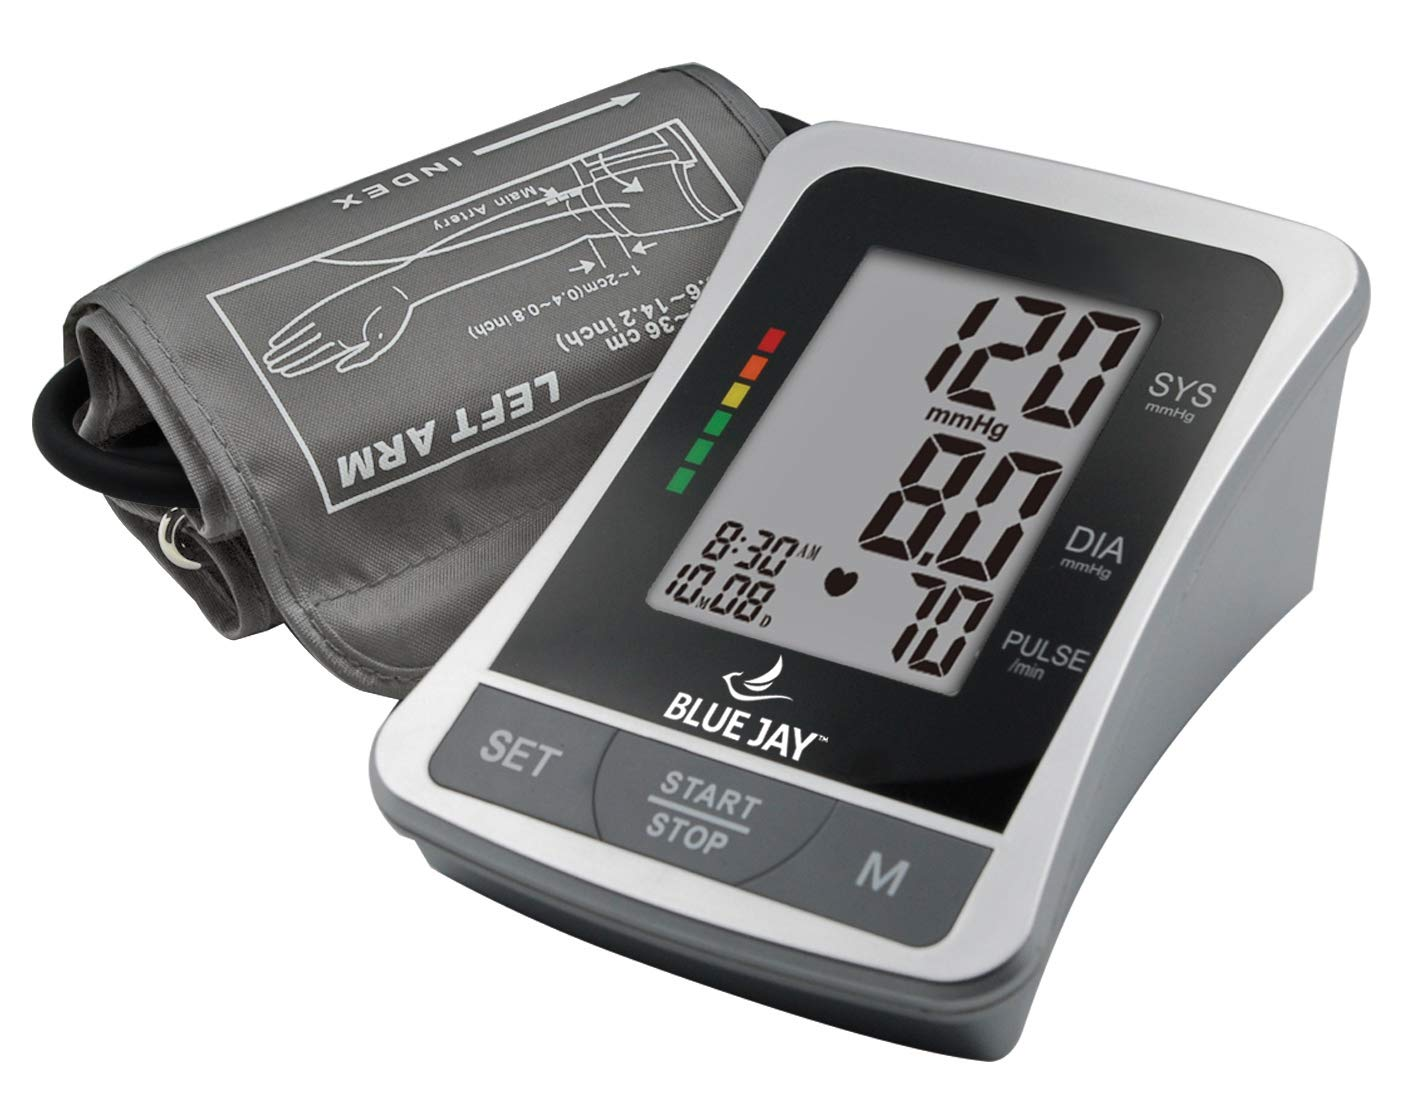 Amazon.com: Blue Jay Perfect Measure Deluxe Large Digit Arm Blood Pressure Kit - Blood Pressure Measuring Kit, Adult BP Meter, 2 Arm Cuffs, ...